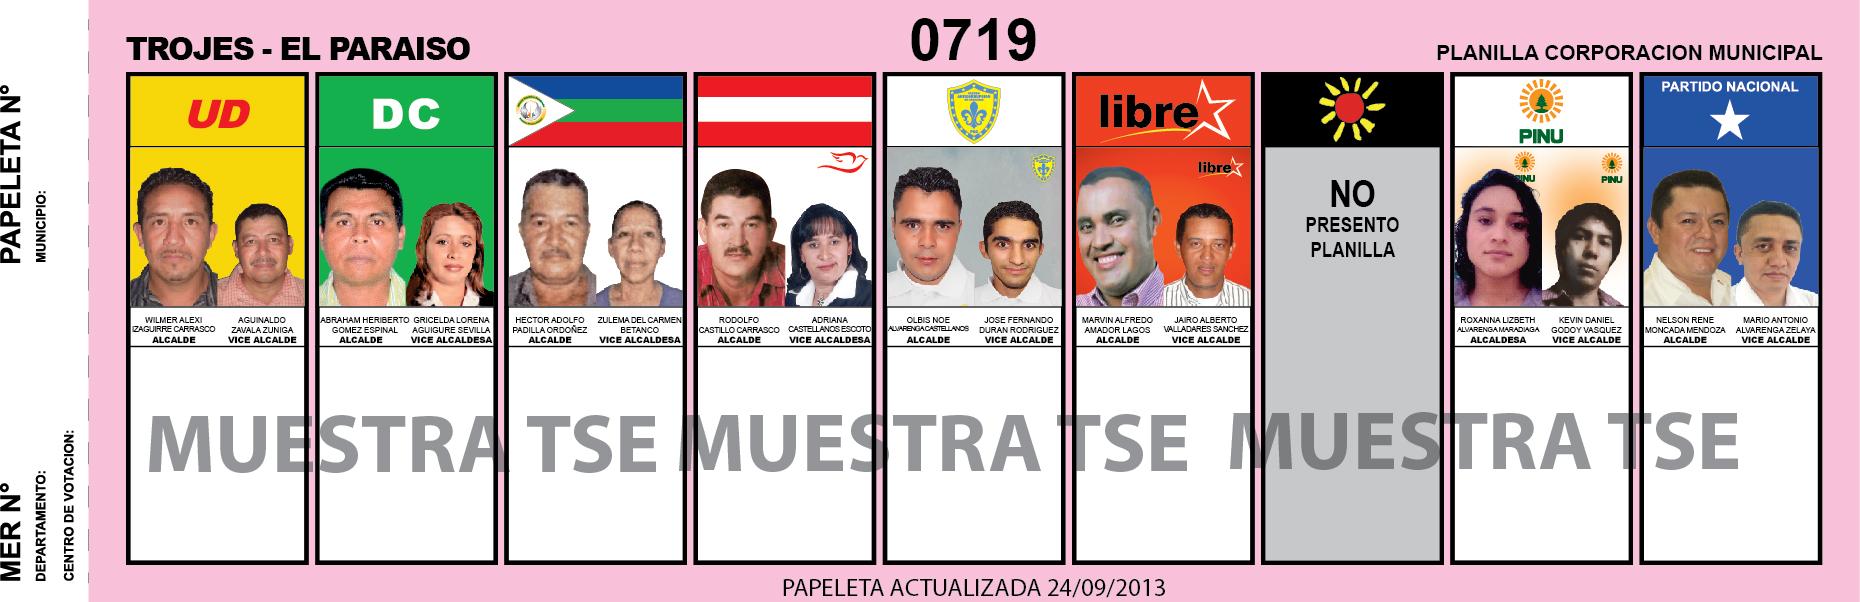 CANDIDATOS 2013 MUNICIPIO TROJES - EL PARAISO - HONDURAS